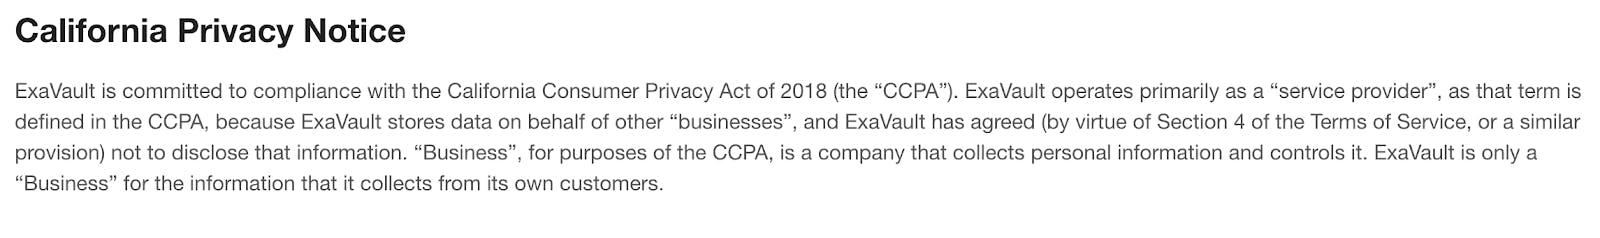 ExaVault CCPA notice.